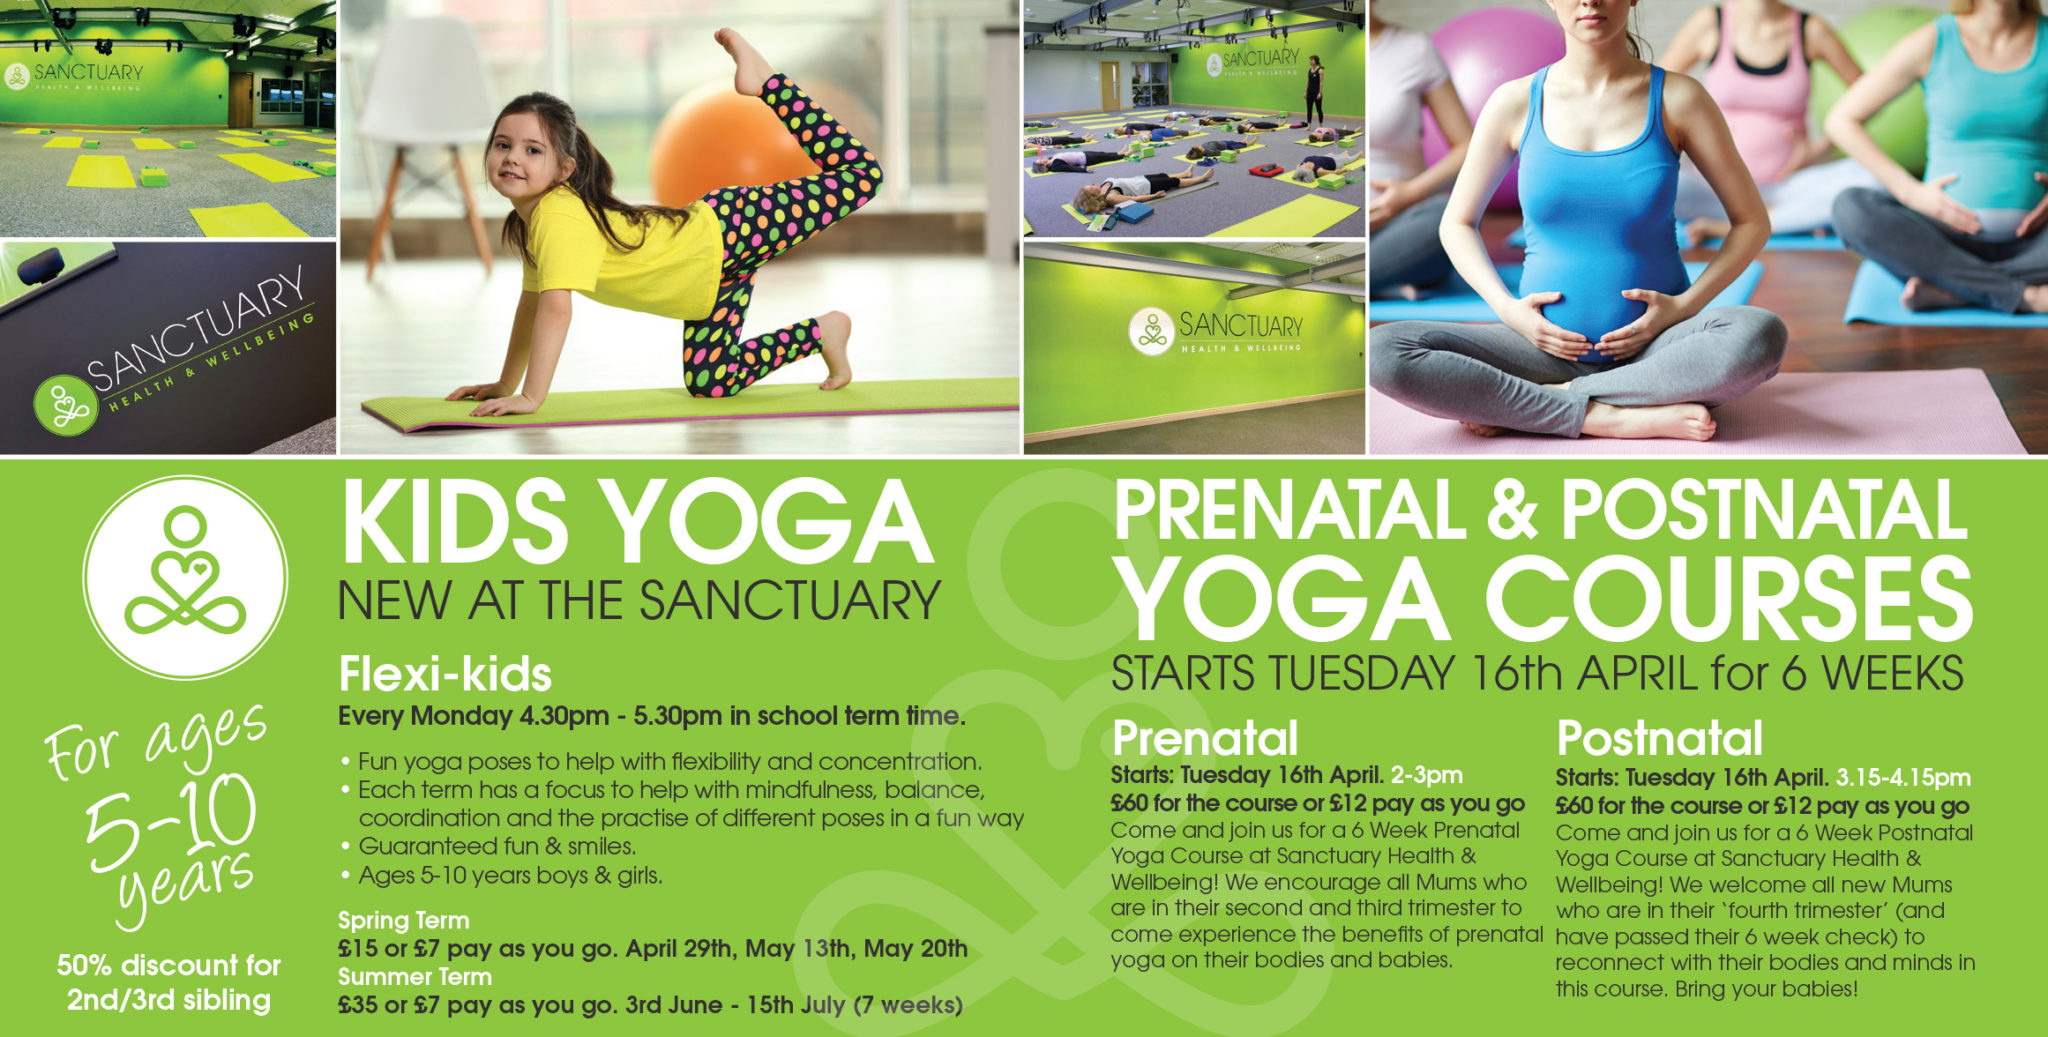 Prenatal & Postnatal and Kids Yoga Courses